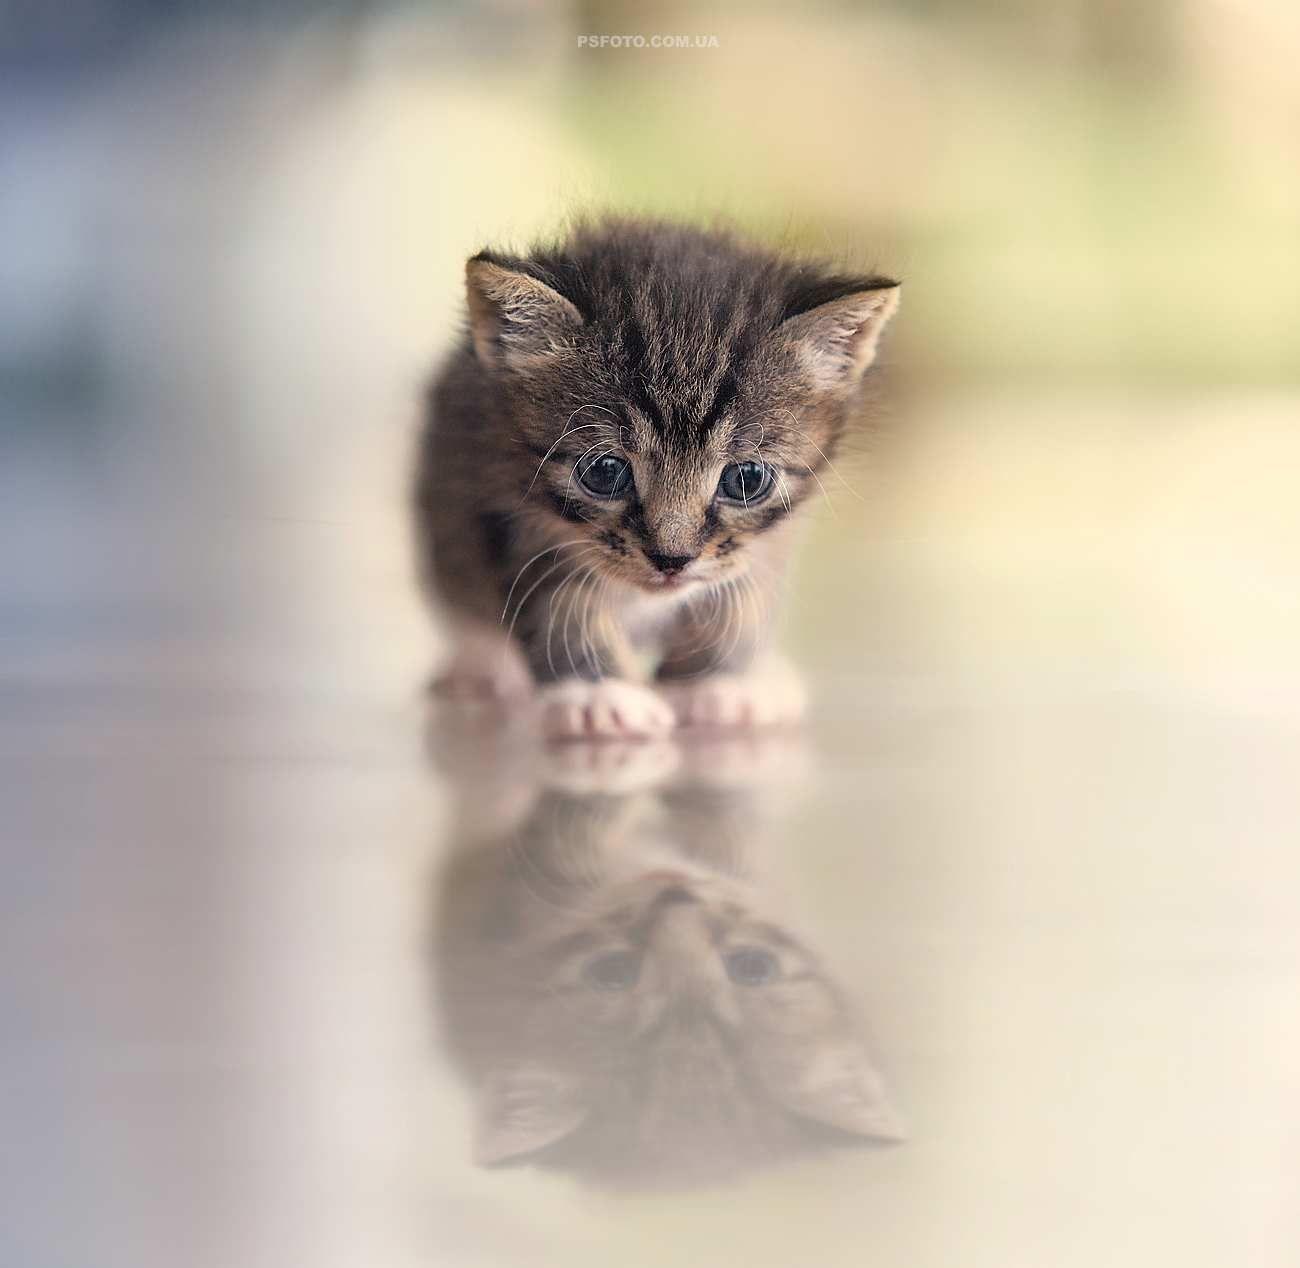 Stunning Animal Portraits By Sergey Polyushko Inspiration - This photographer is celebrating stray cats through majestic portrait photographs